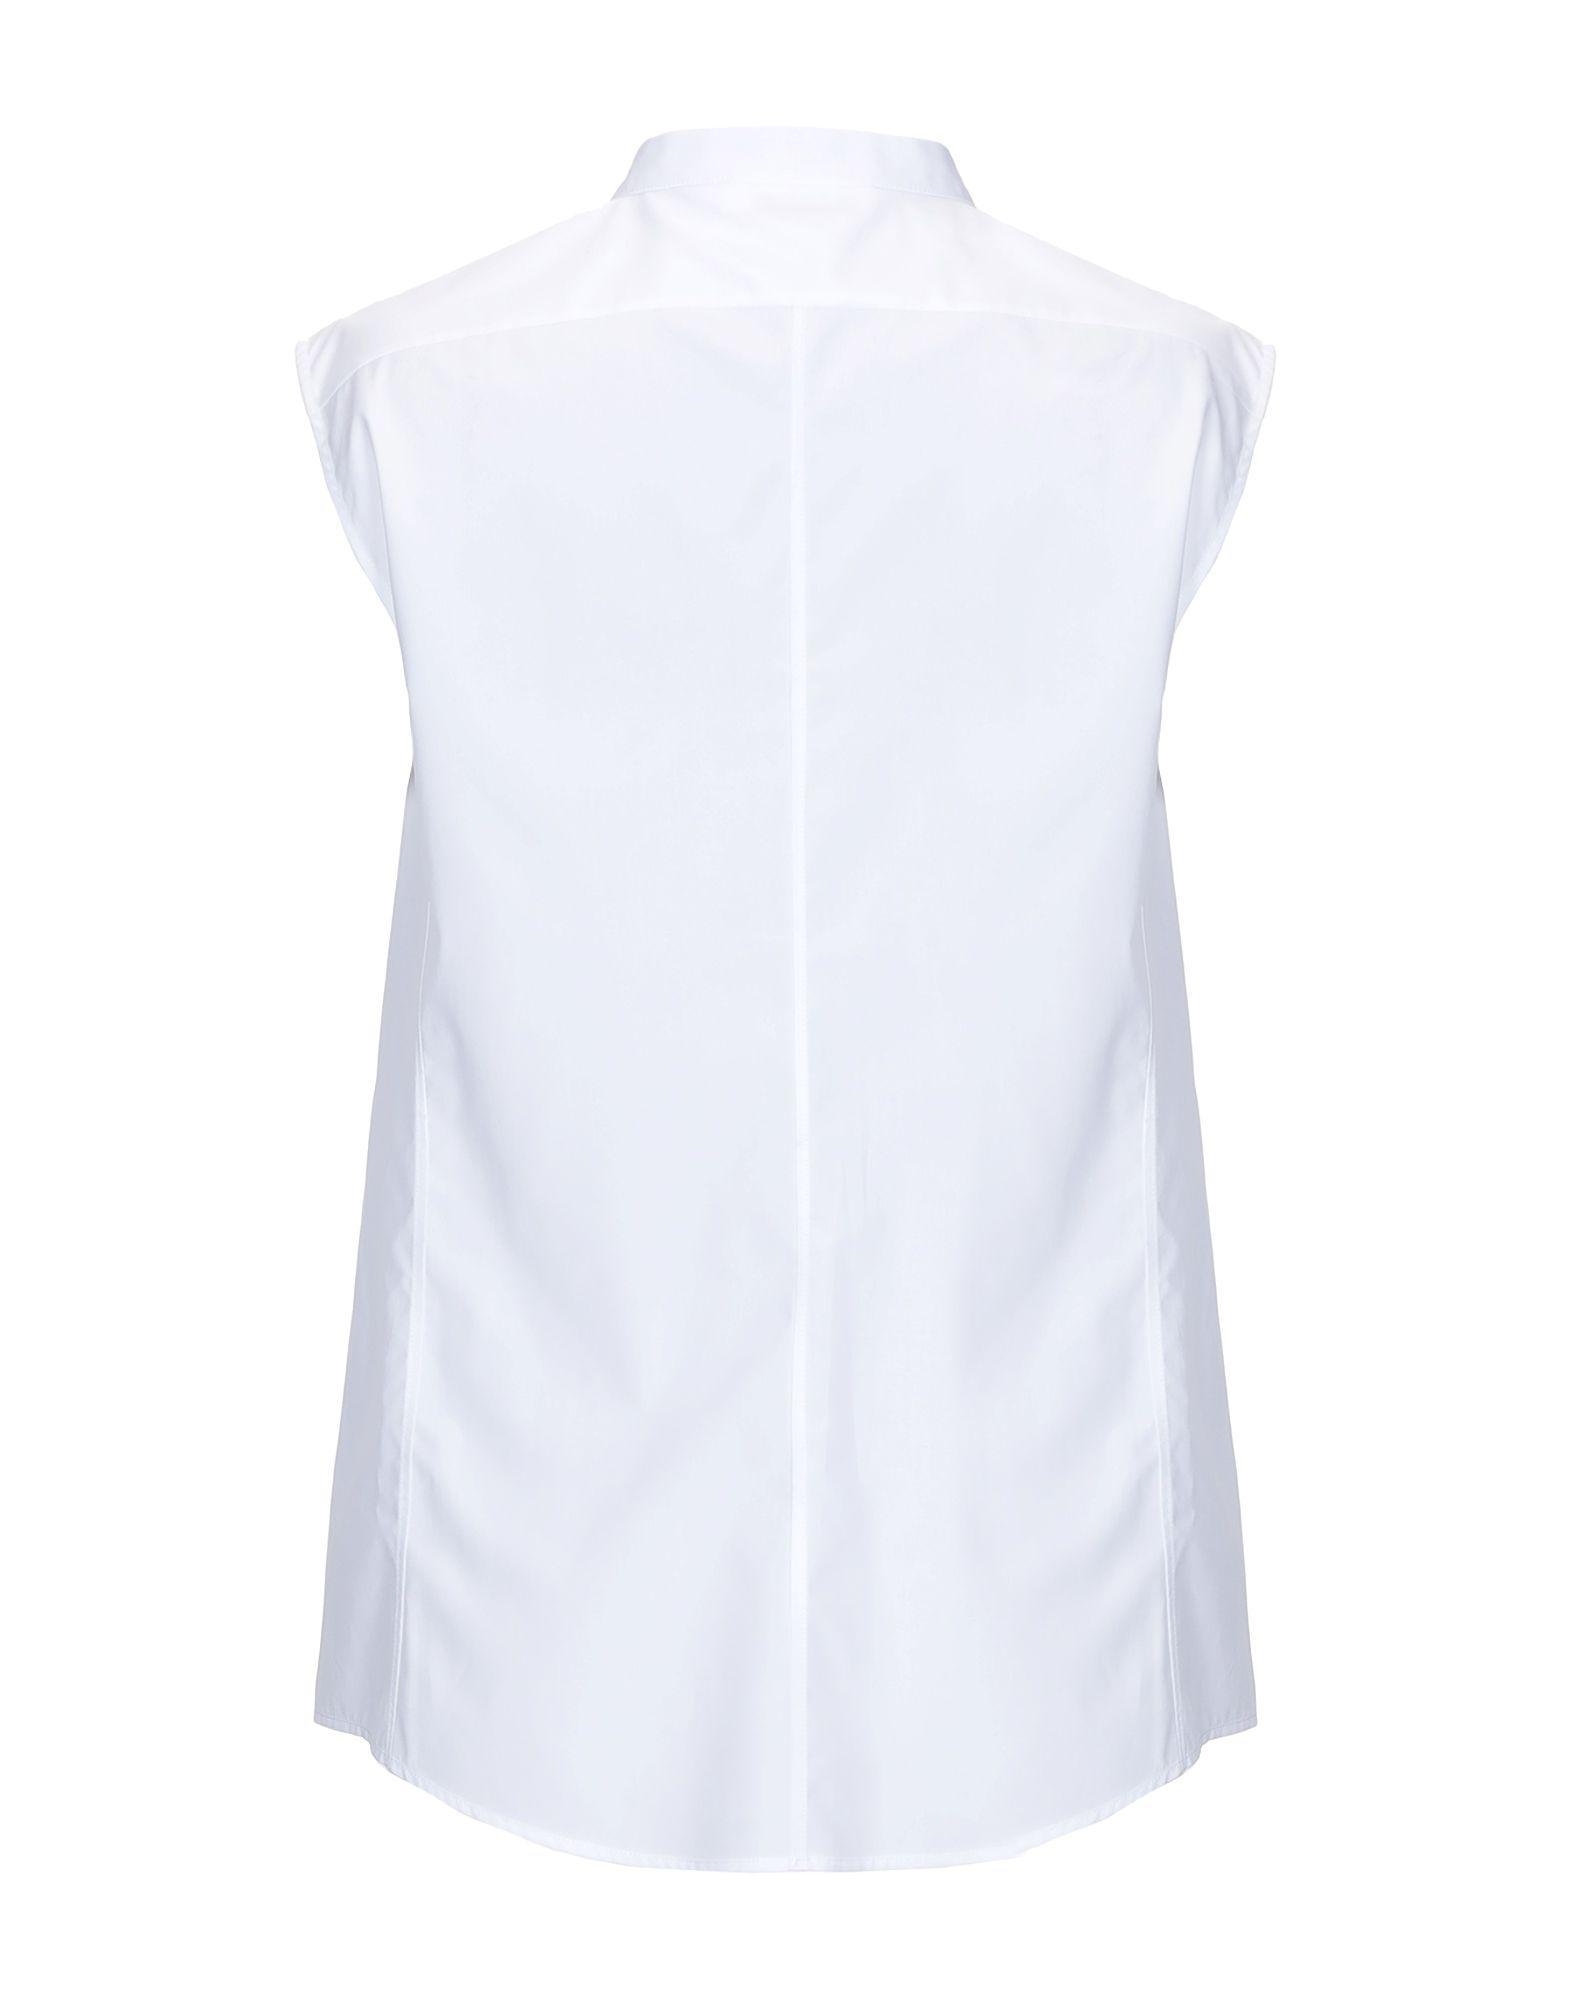 db822872 Lyst - Jil Sander Shirt in White